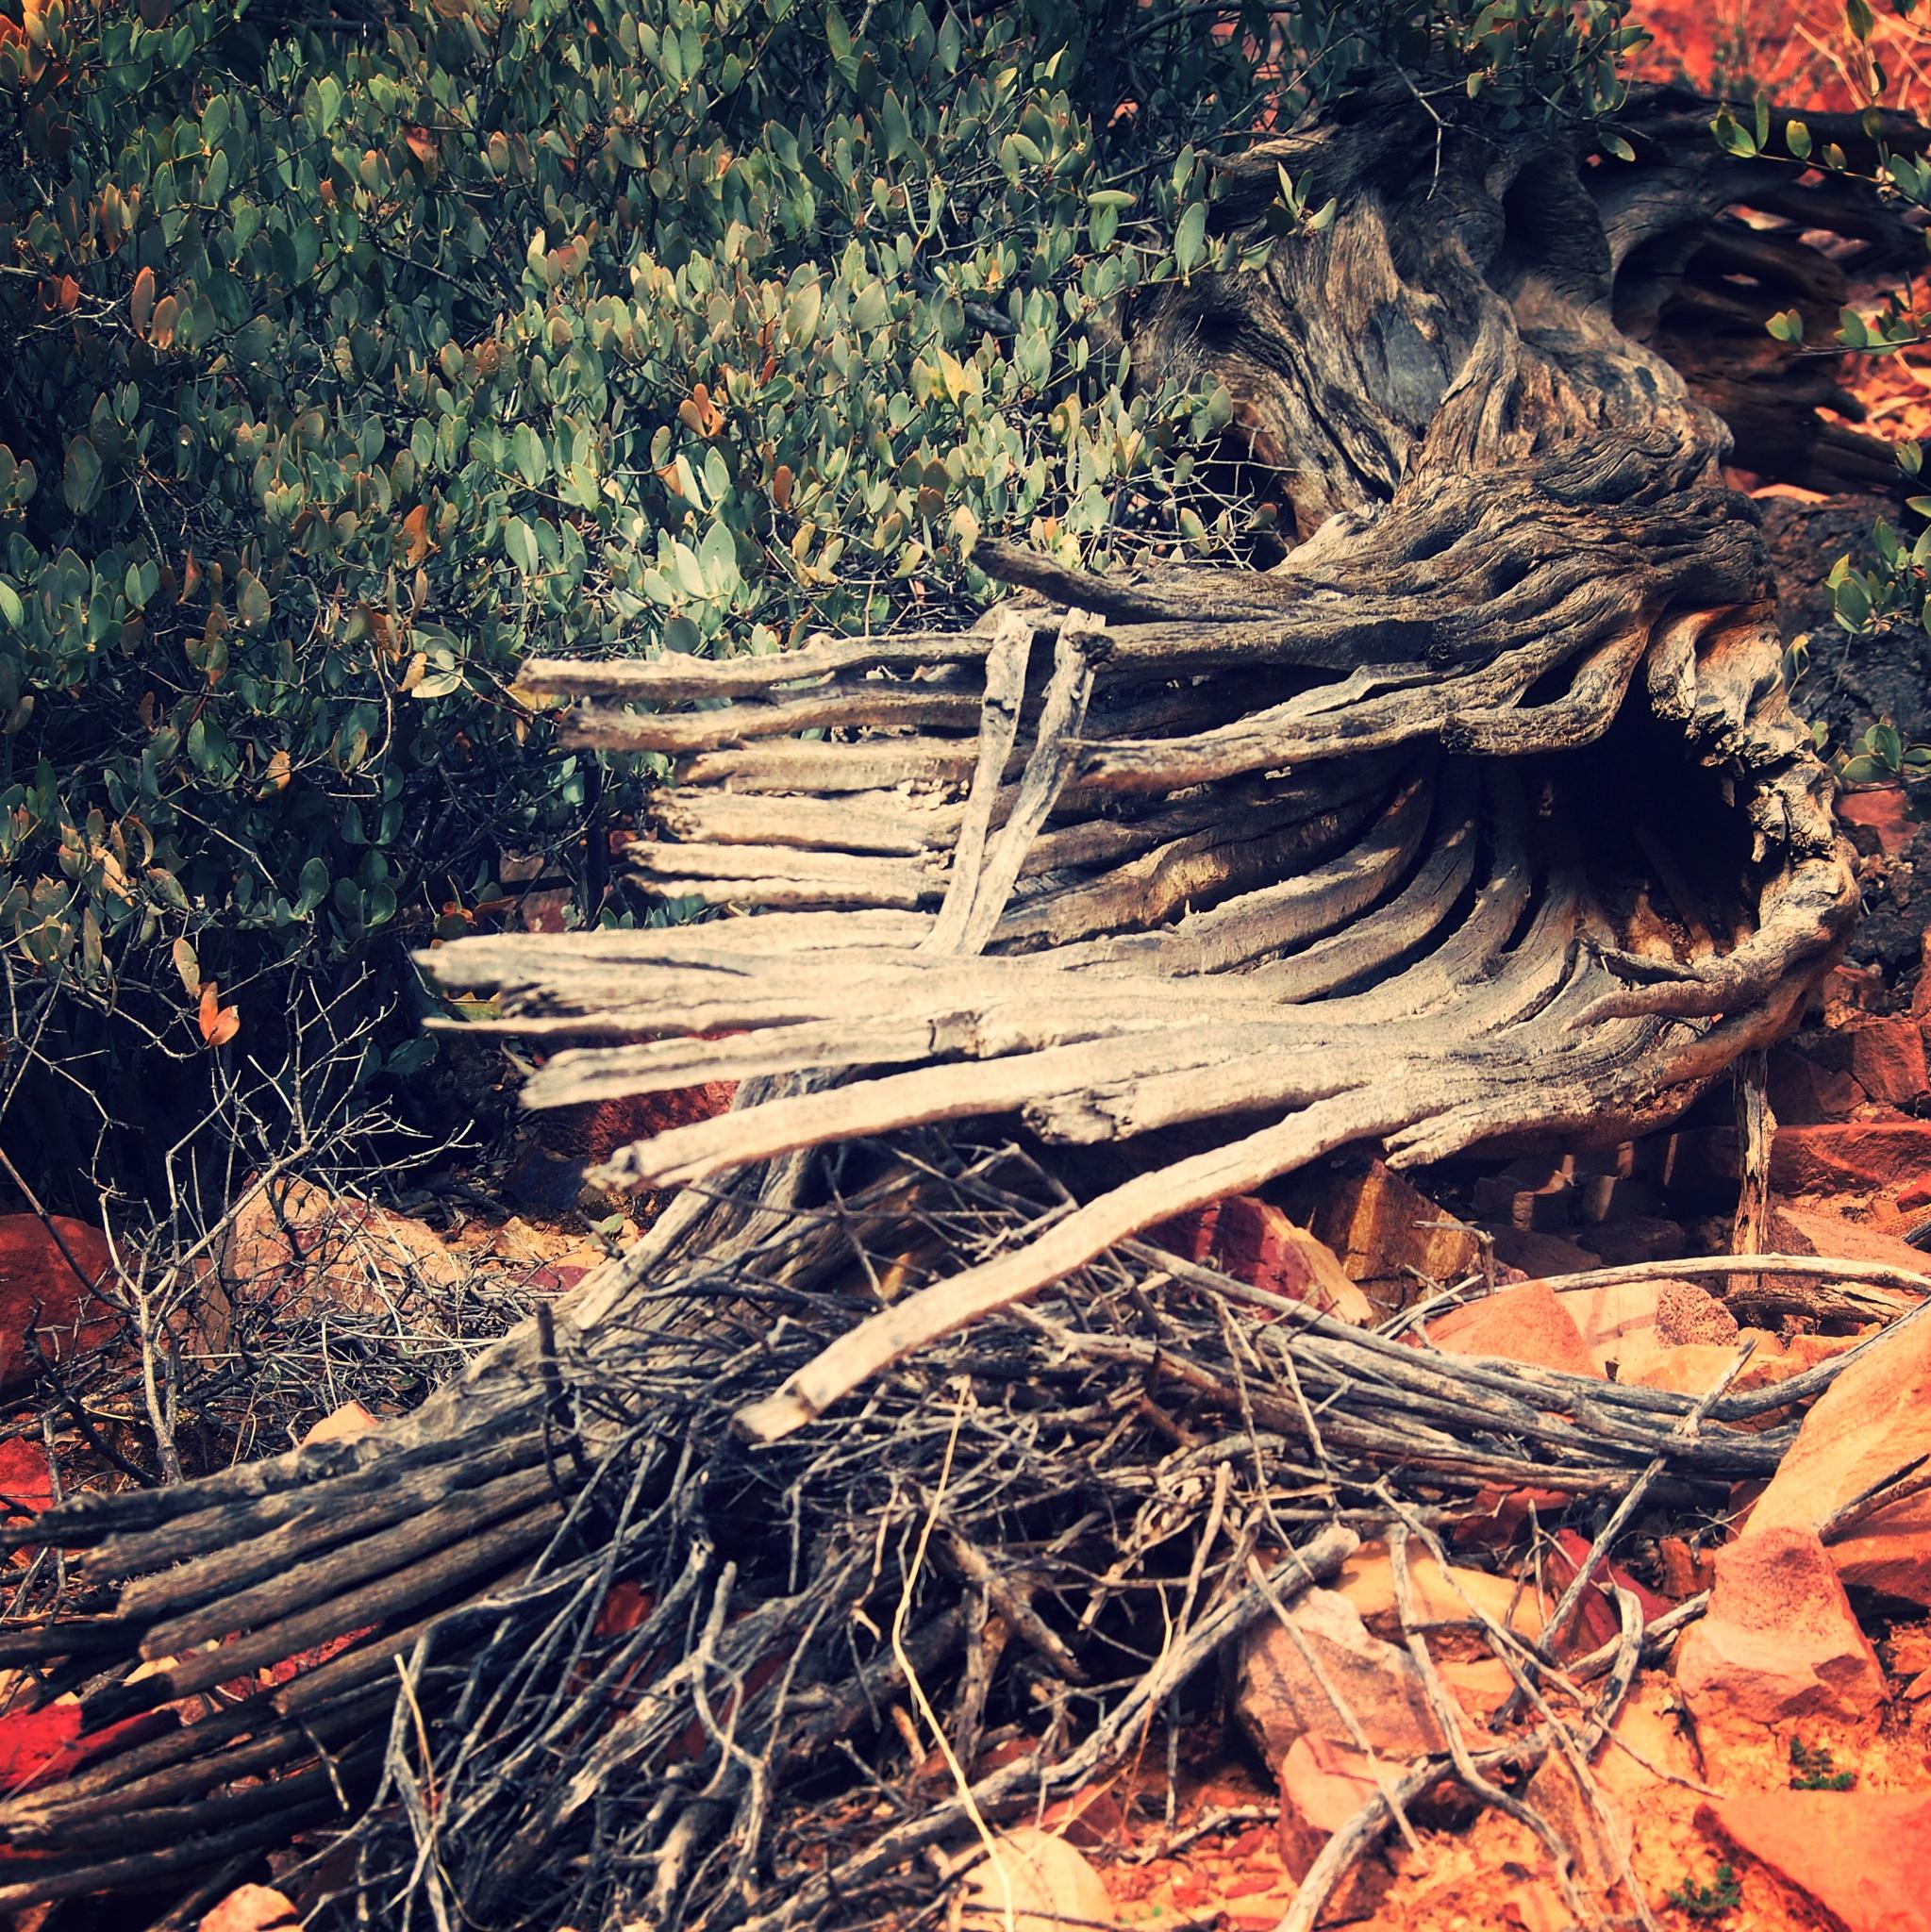 Death of a Cactus by Tina Shragal